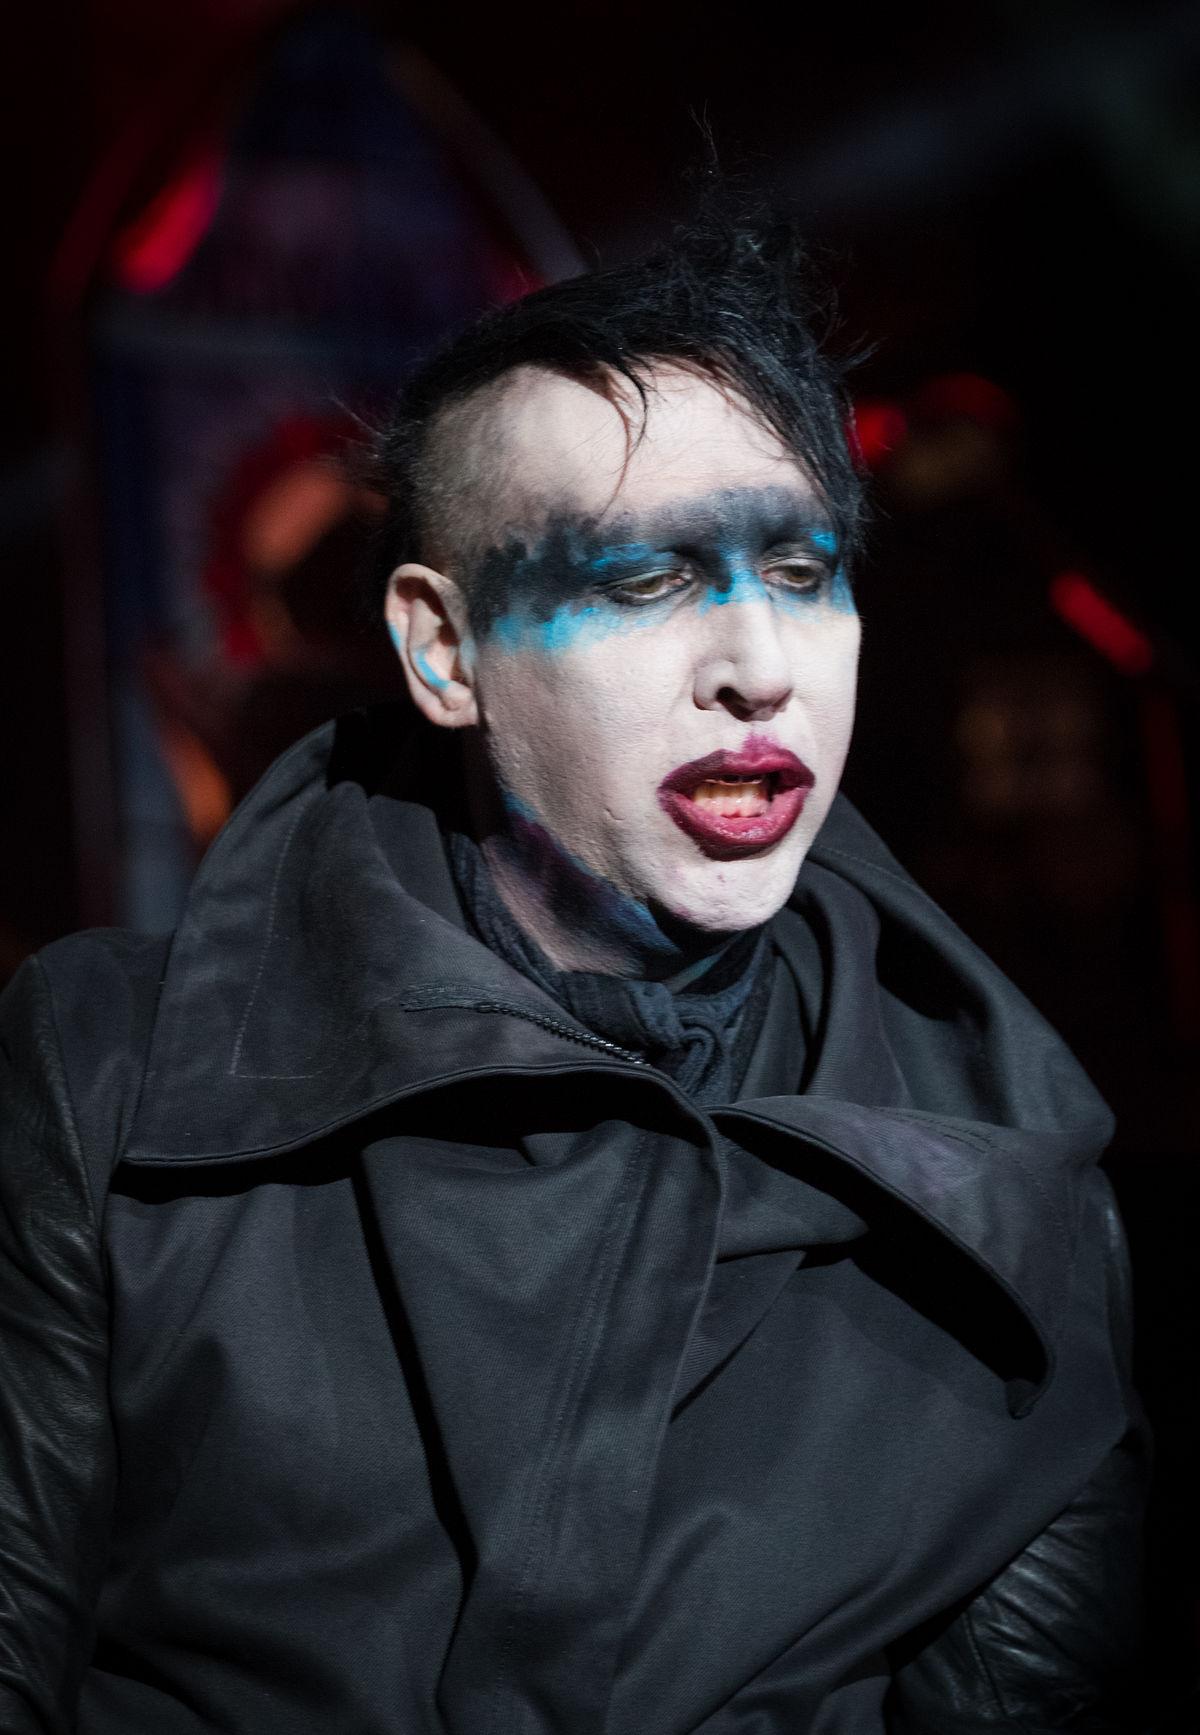 Marilyn Manson - Wikipedia, la enciclopedia libre